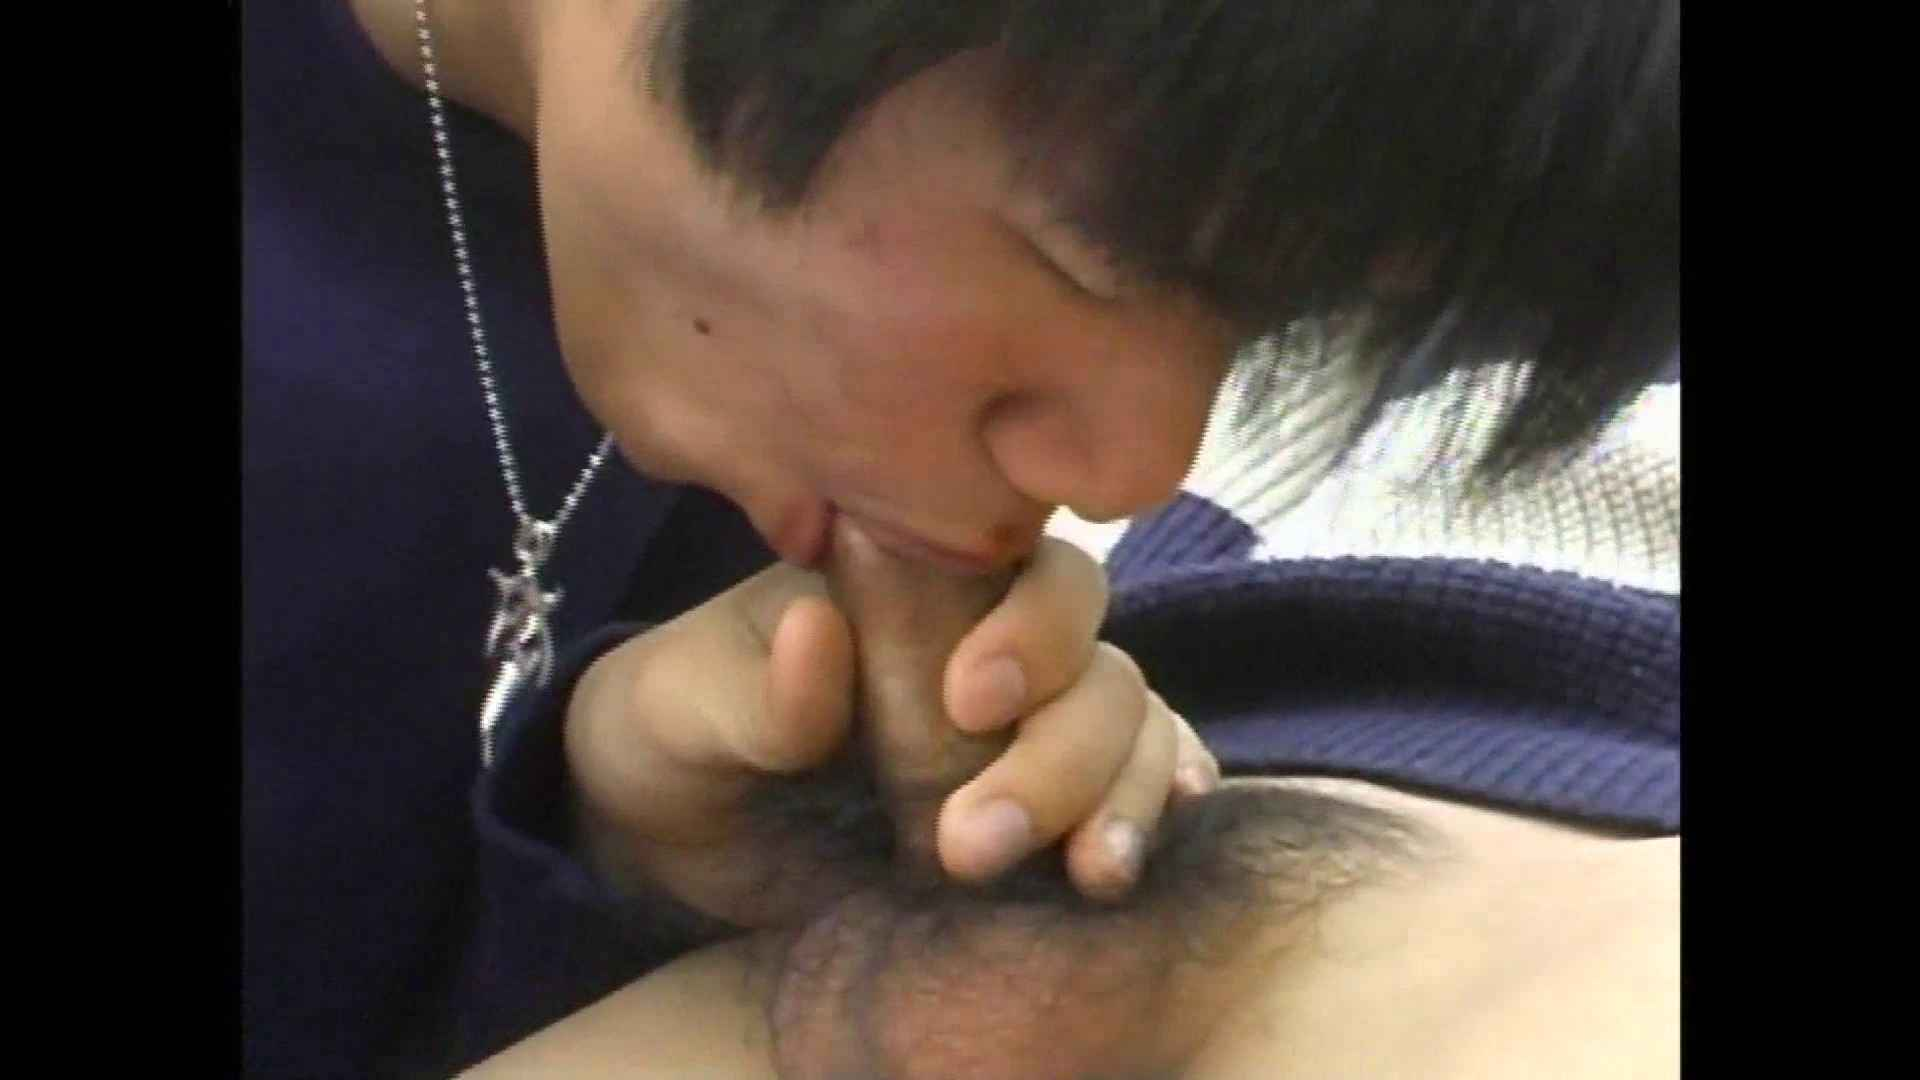 GAYBOY宏のオカズ倉庫Vol.5-2 お風呂 ゲイエロ動画 78pic 47